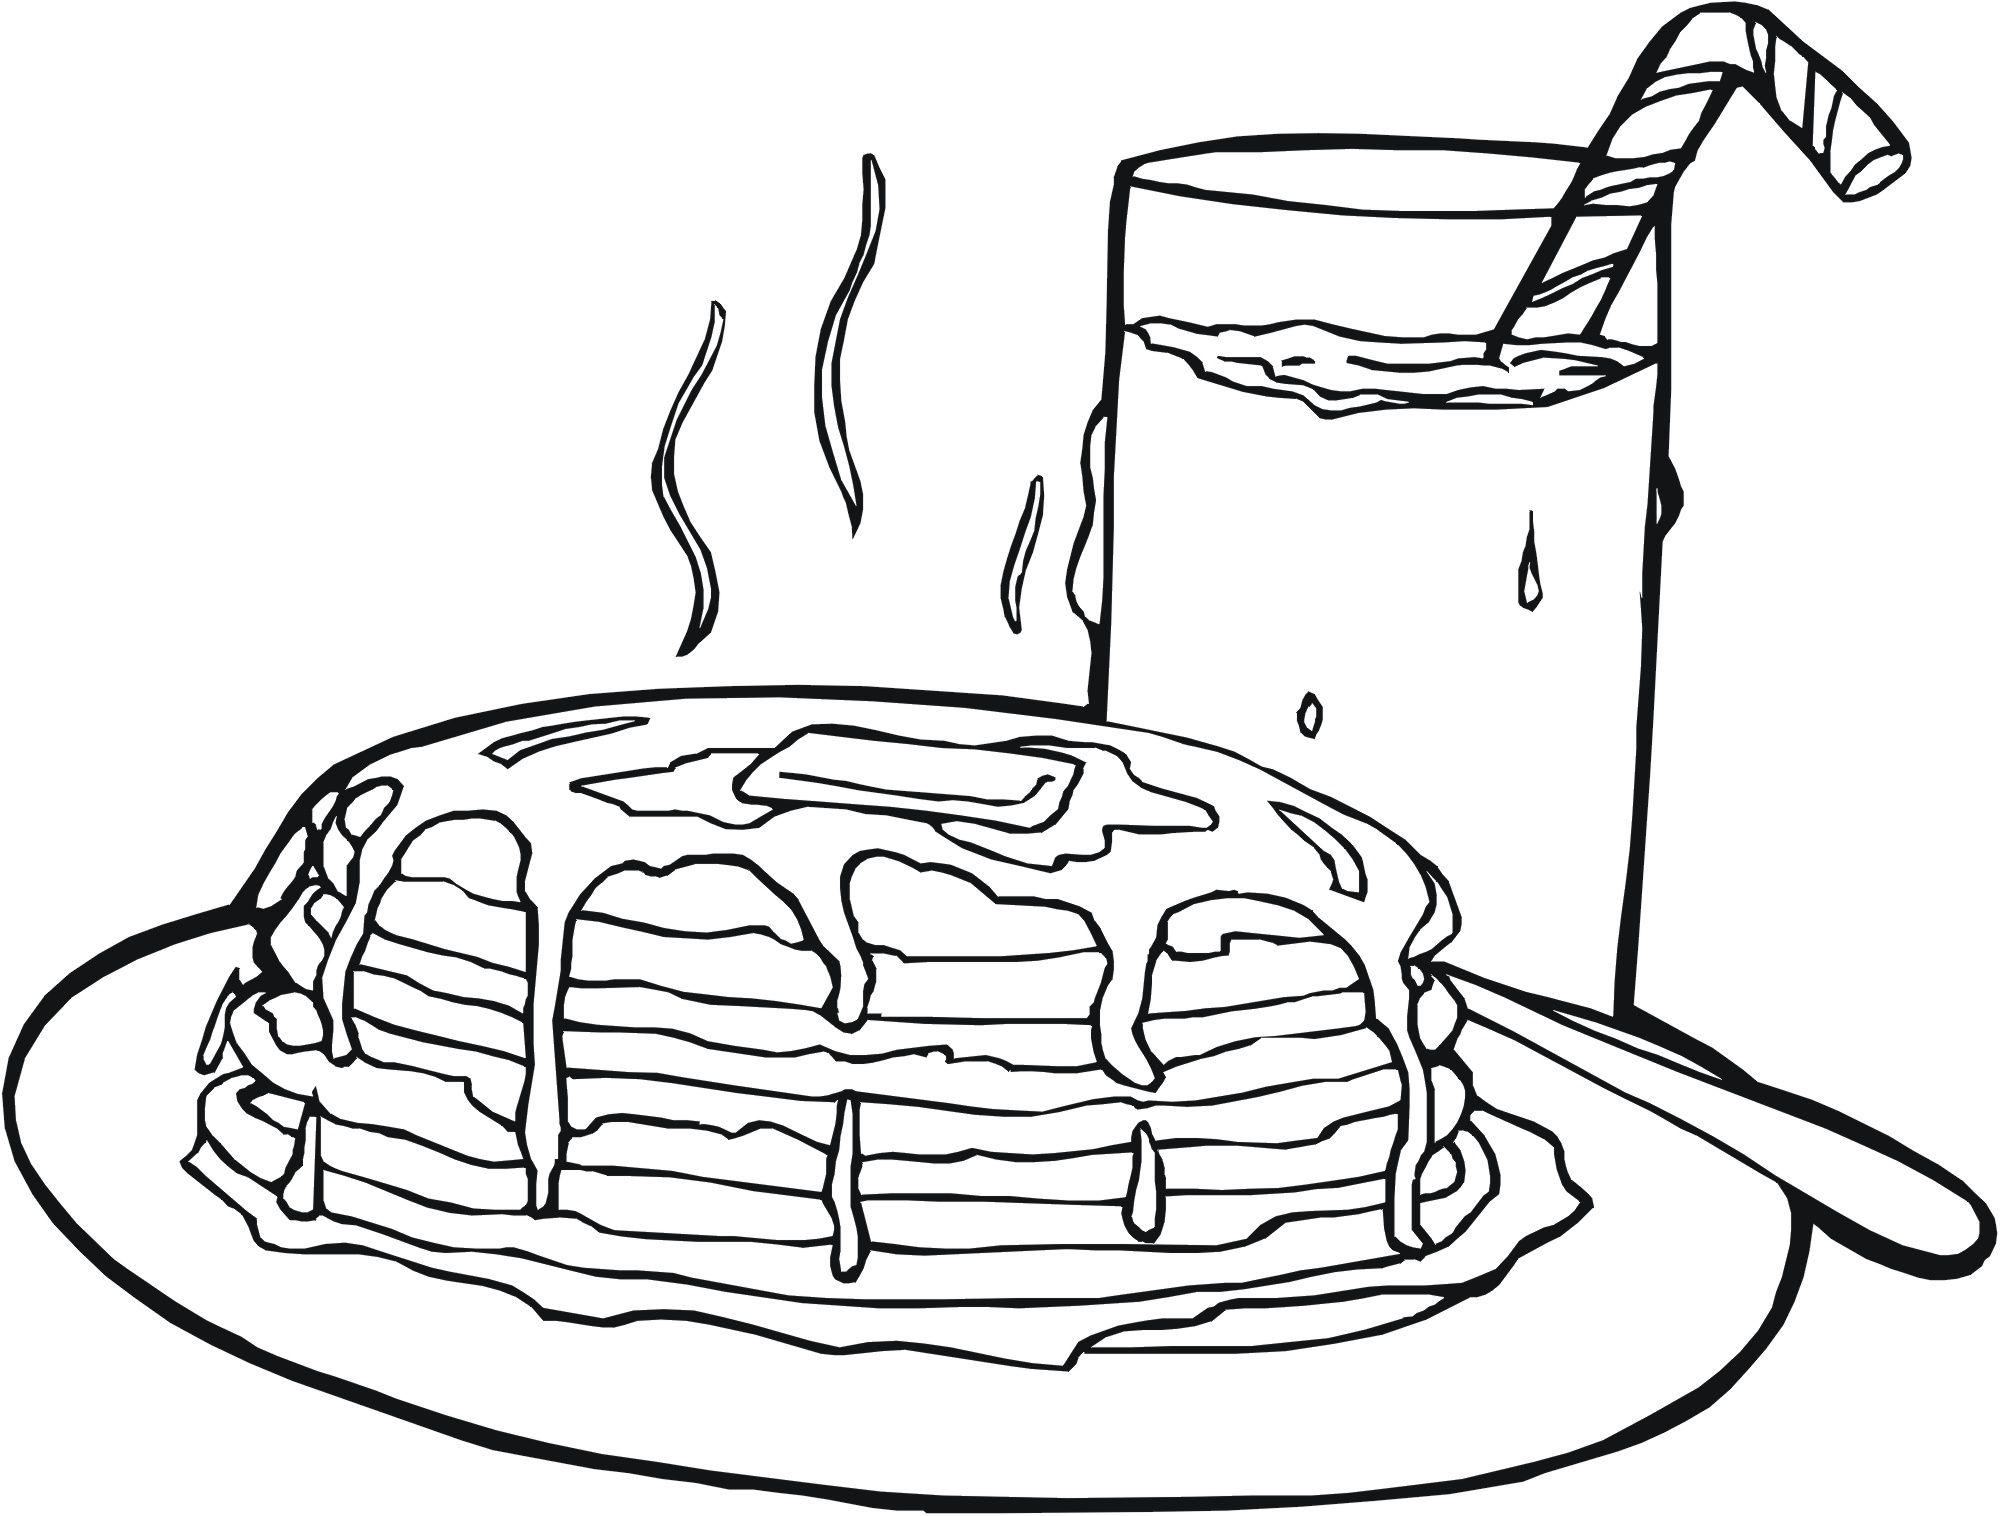 2000x1516 Pancake Coloring Pages